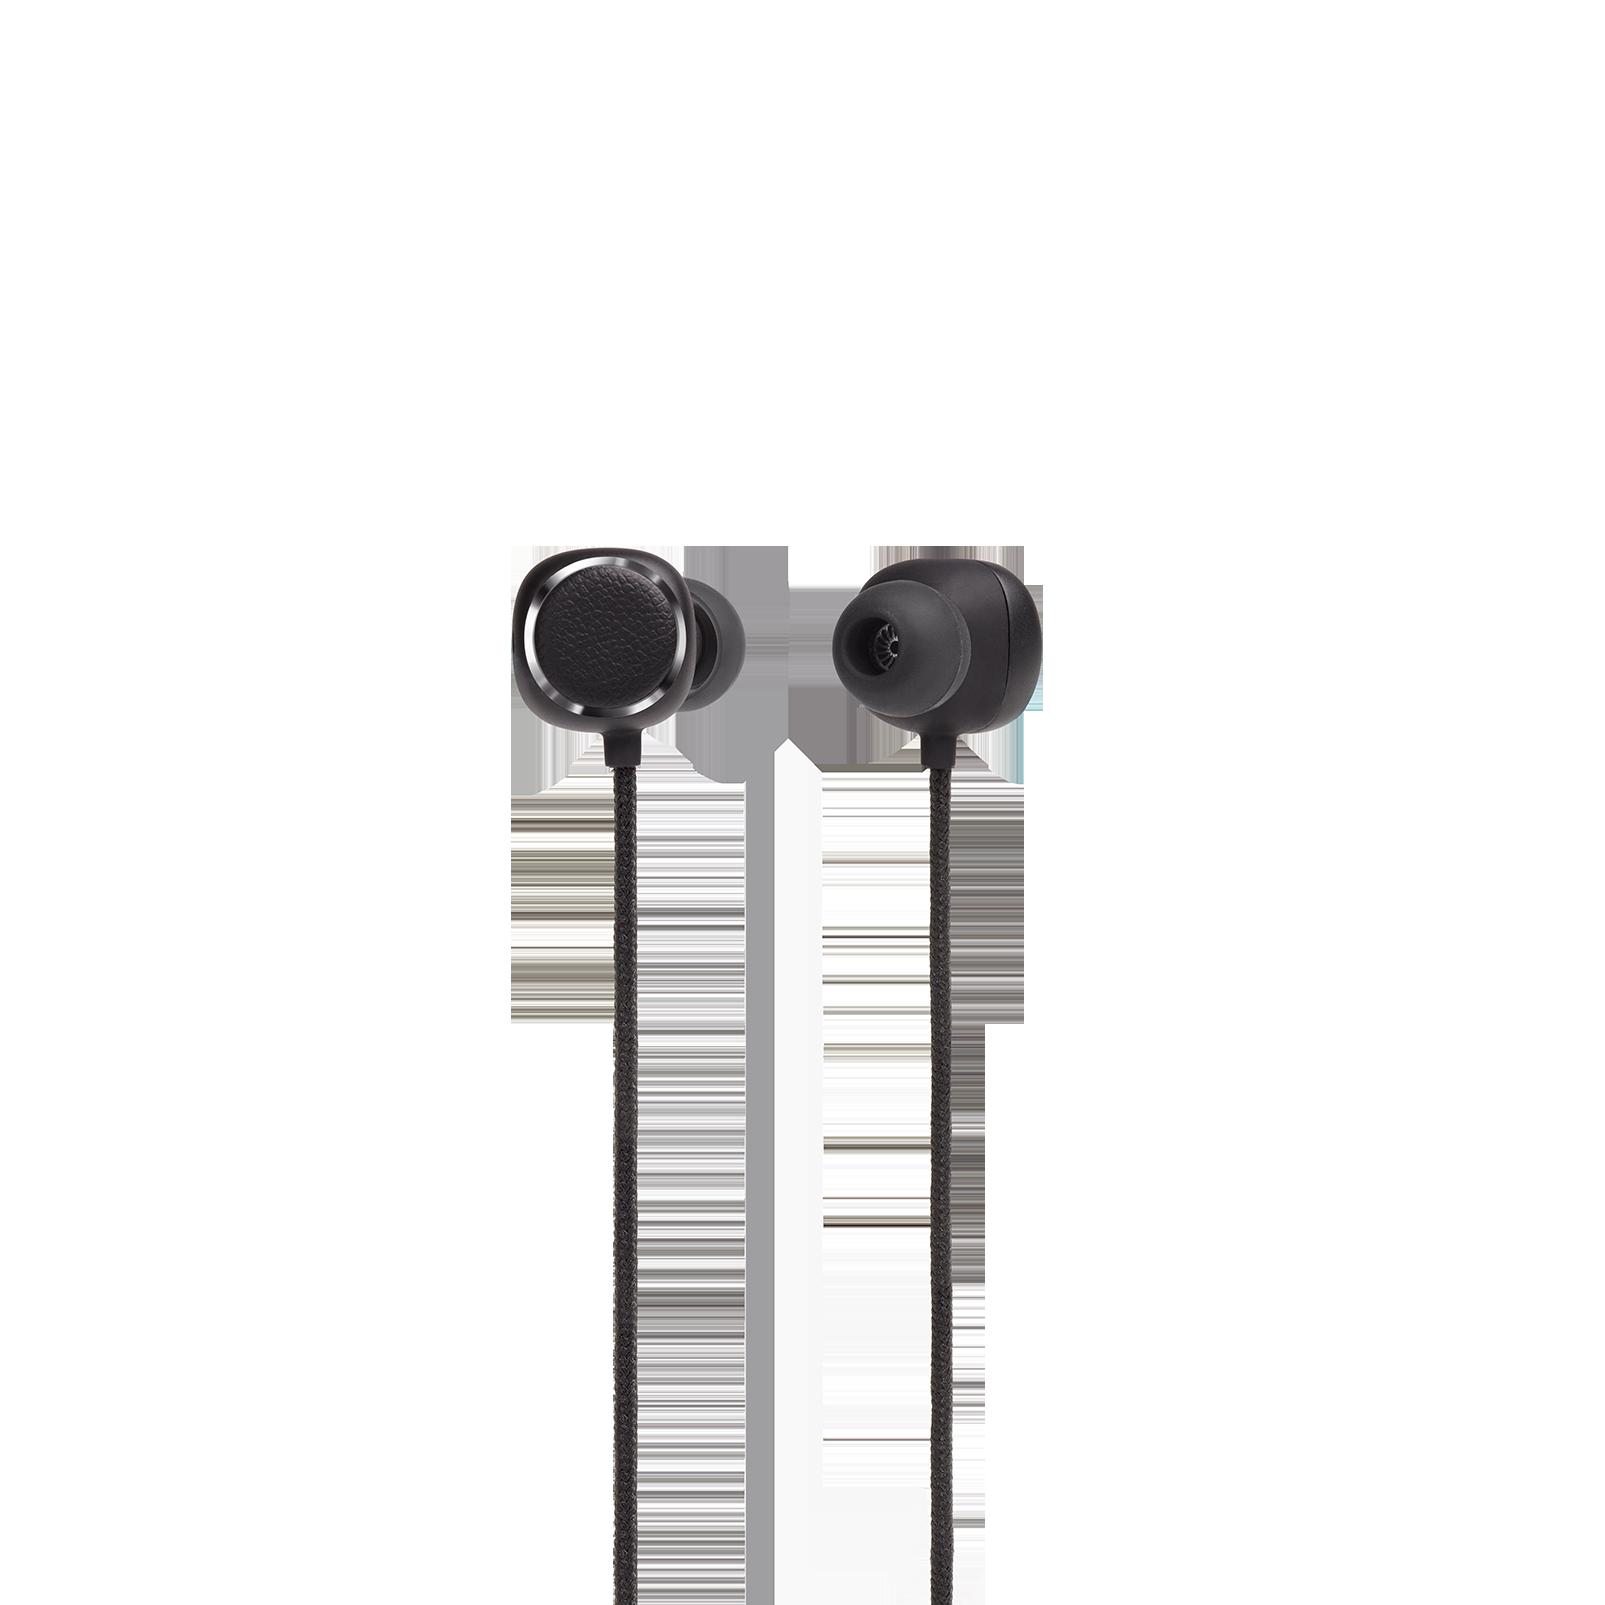 Harman Kardon FLY BT - Black - Bluetooth in-ear headphones - Front